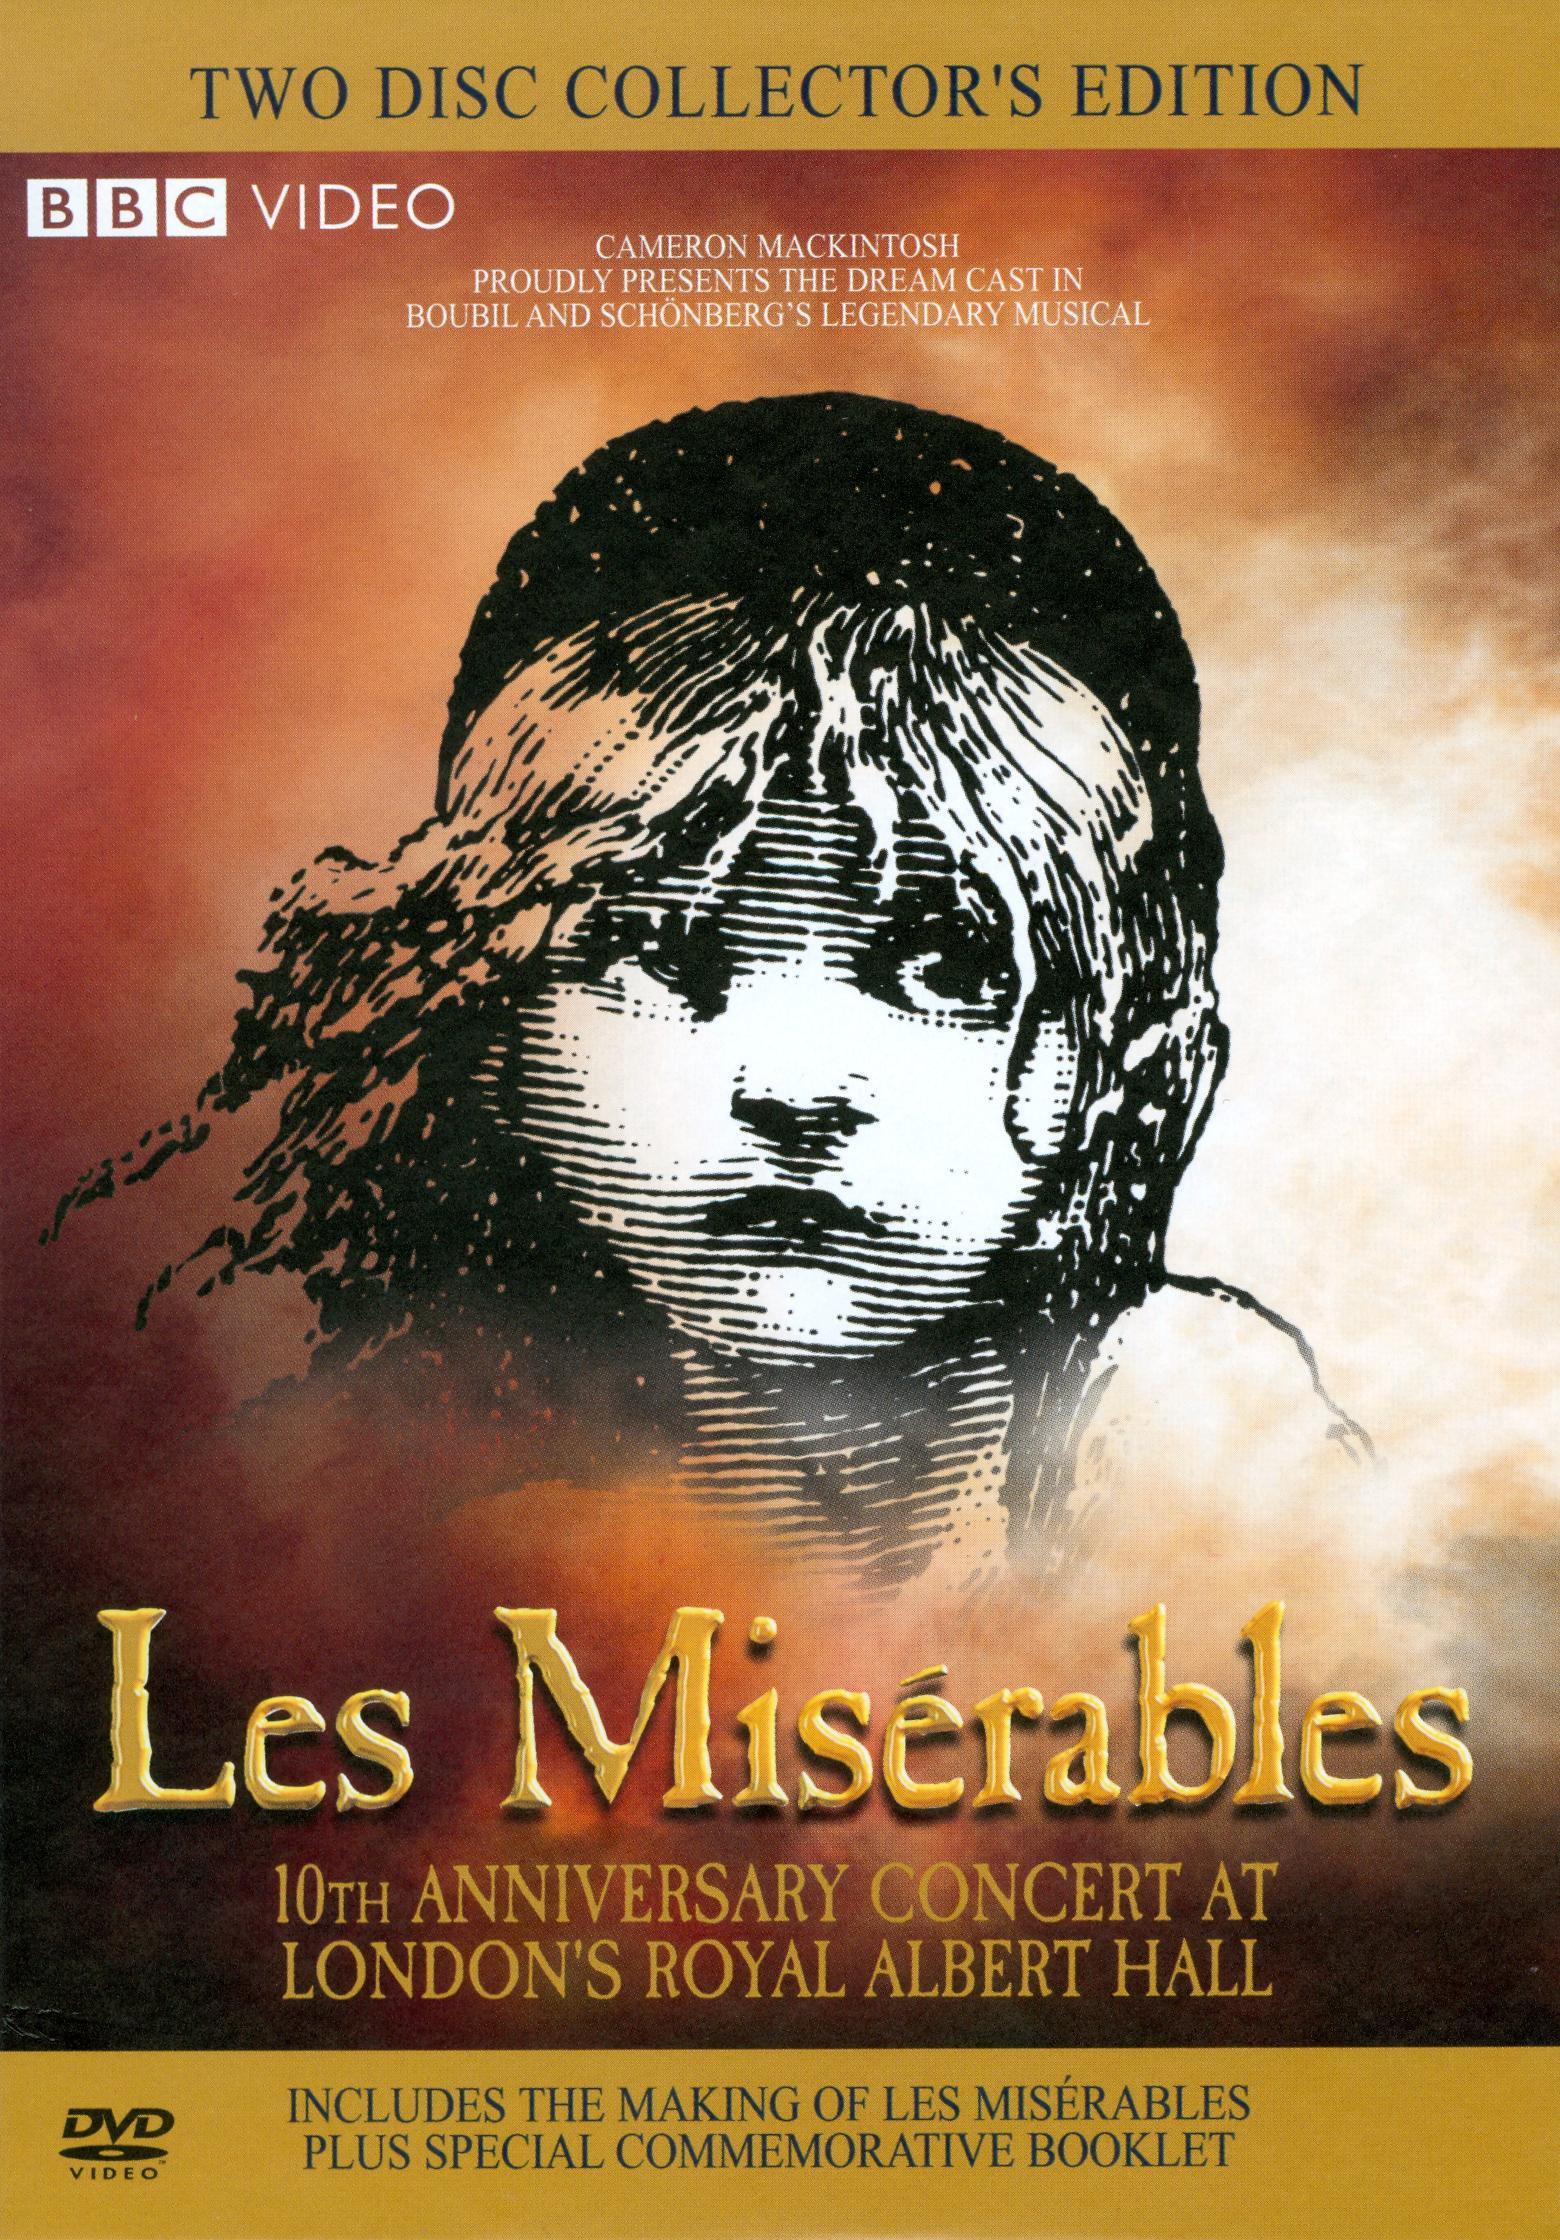 Les Miserables: 10th Anniversary Concert at London's Royal Albert Hall